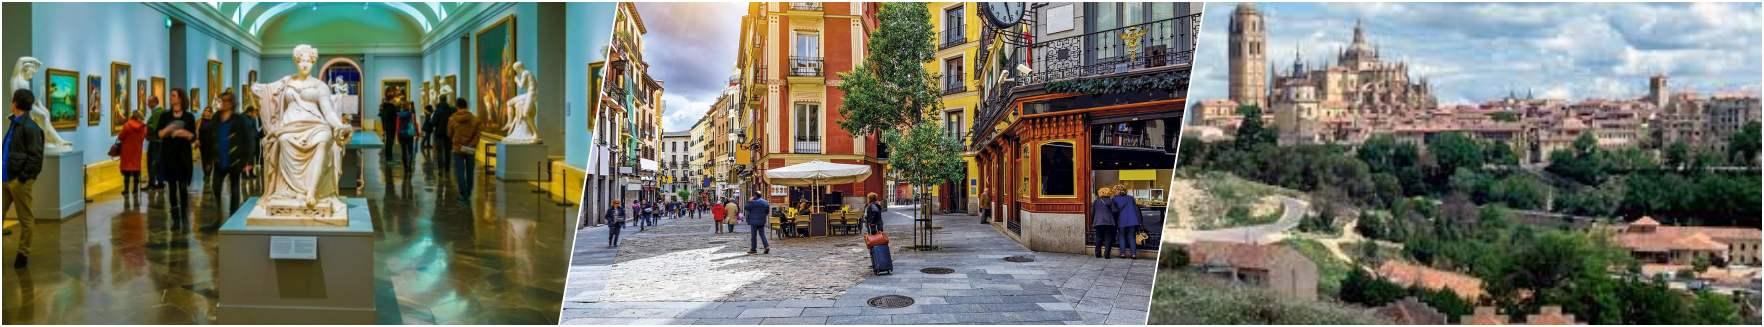 Prado Museum - Barrio de las letras - Segovia